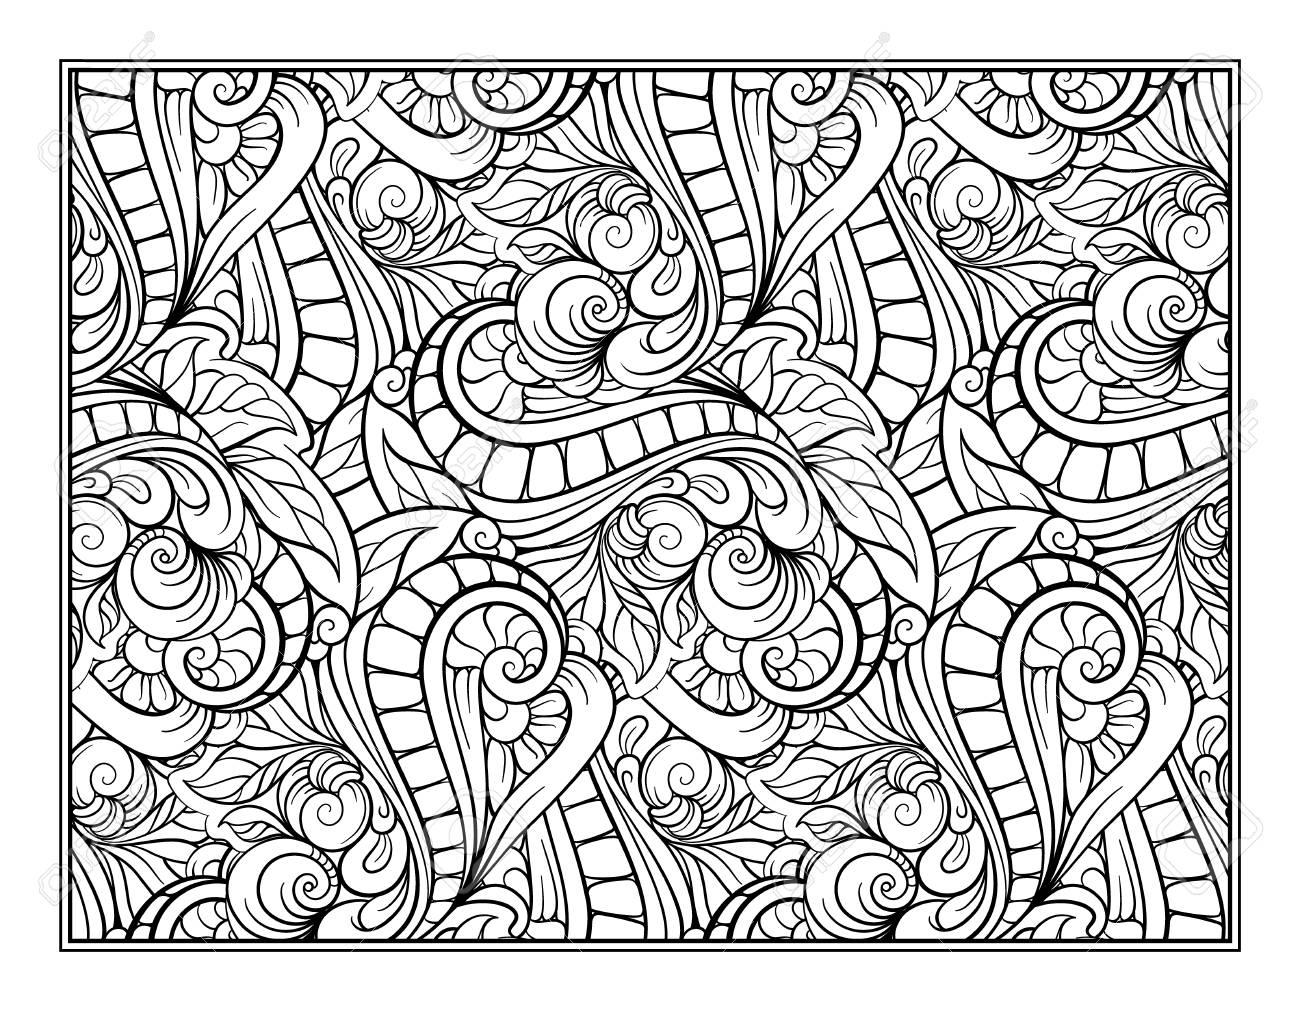 Paisley- Und Mandalamuster Im Rahmen. Ausmalbilder Zum Ausmalen